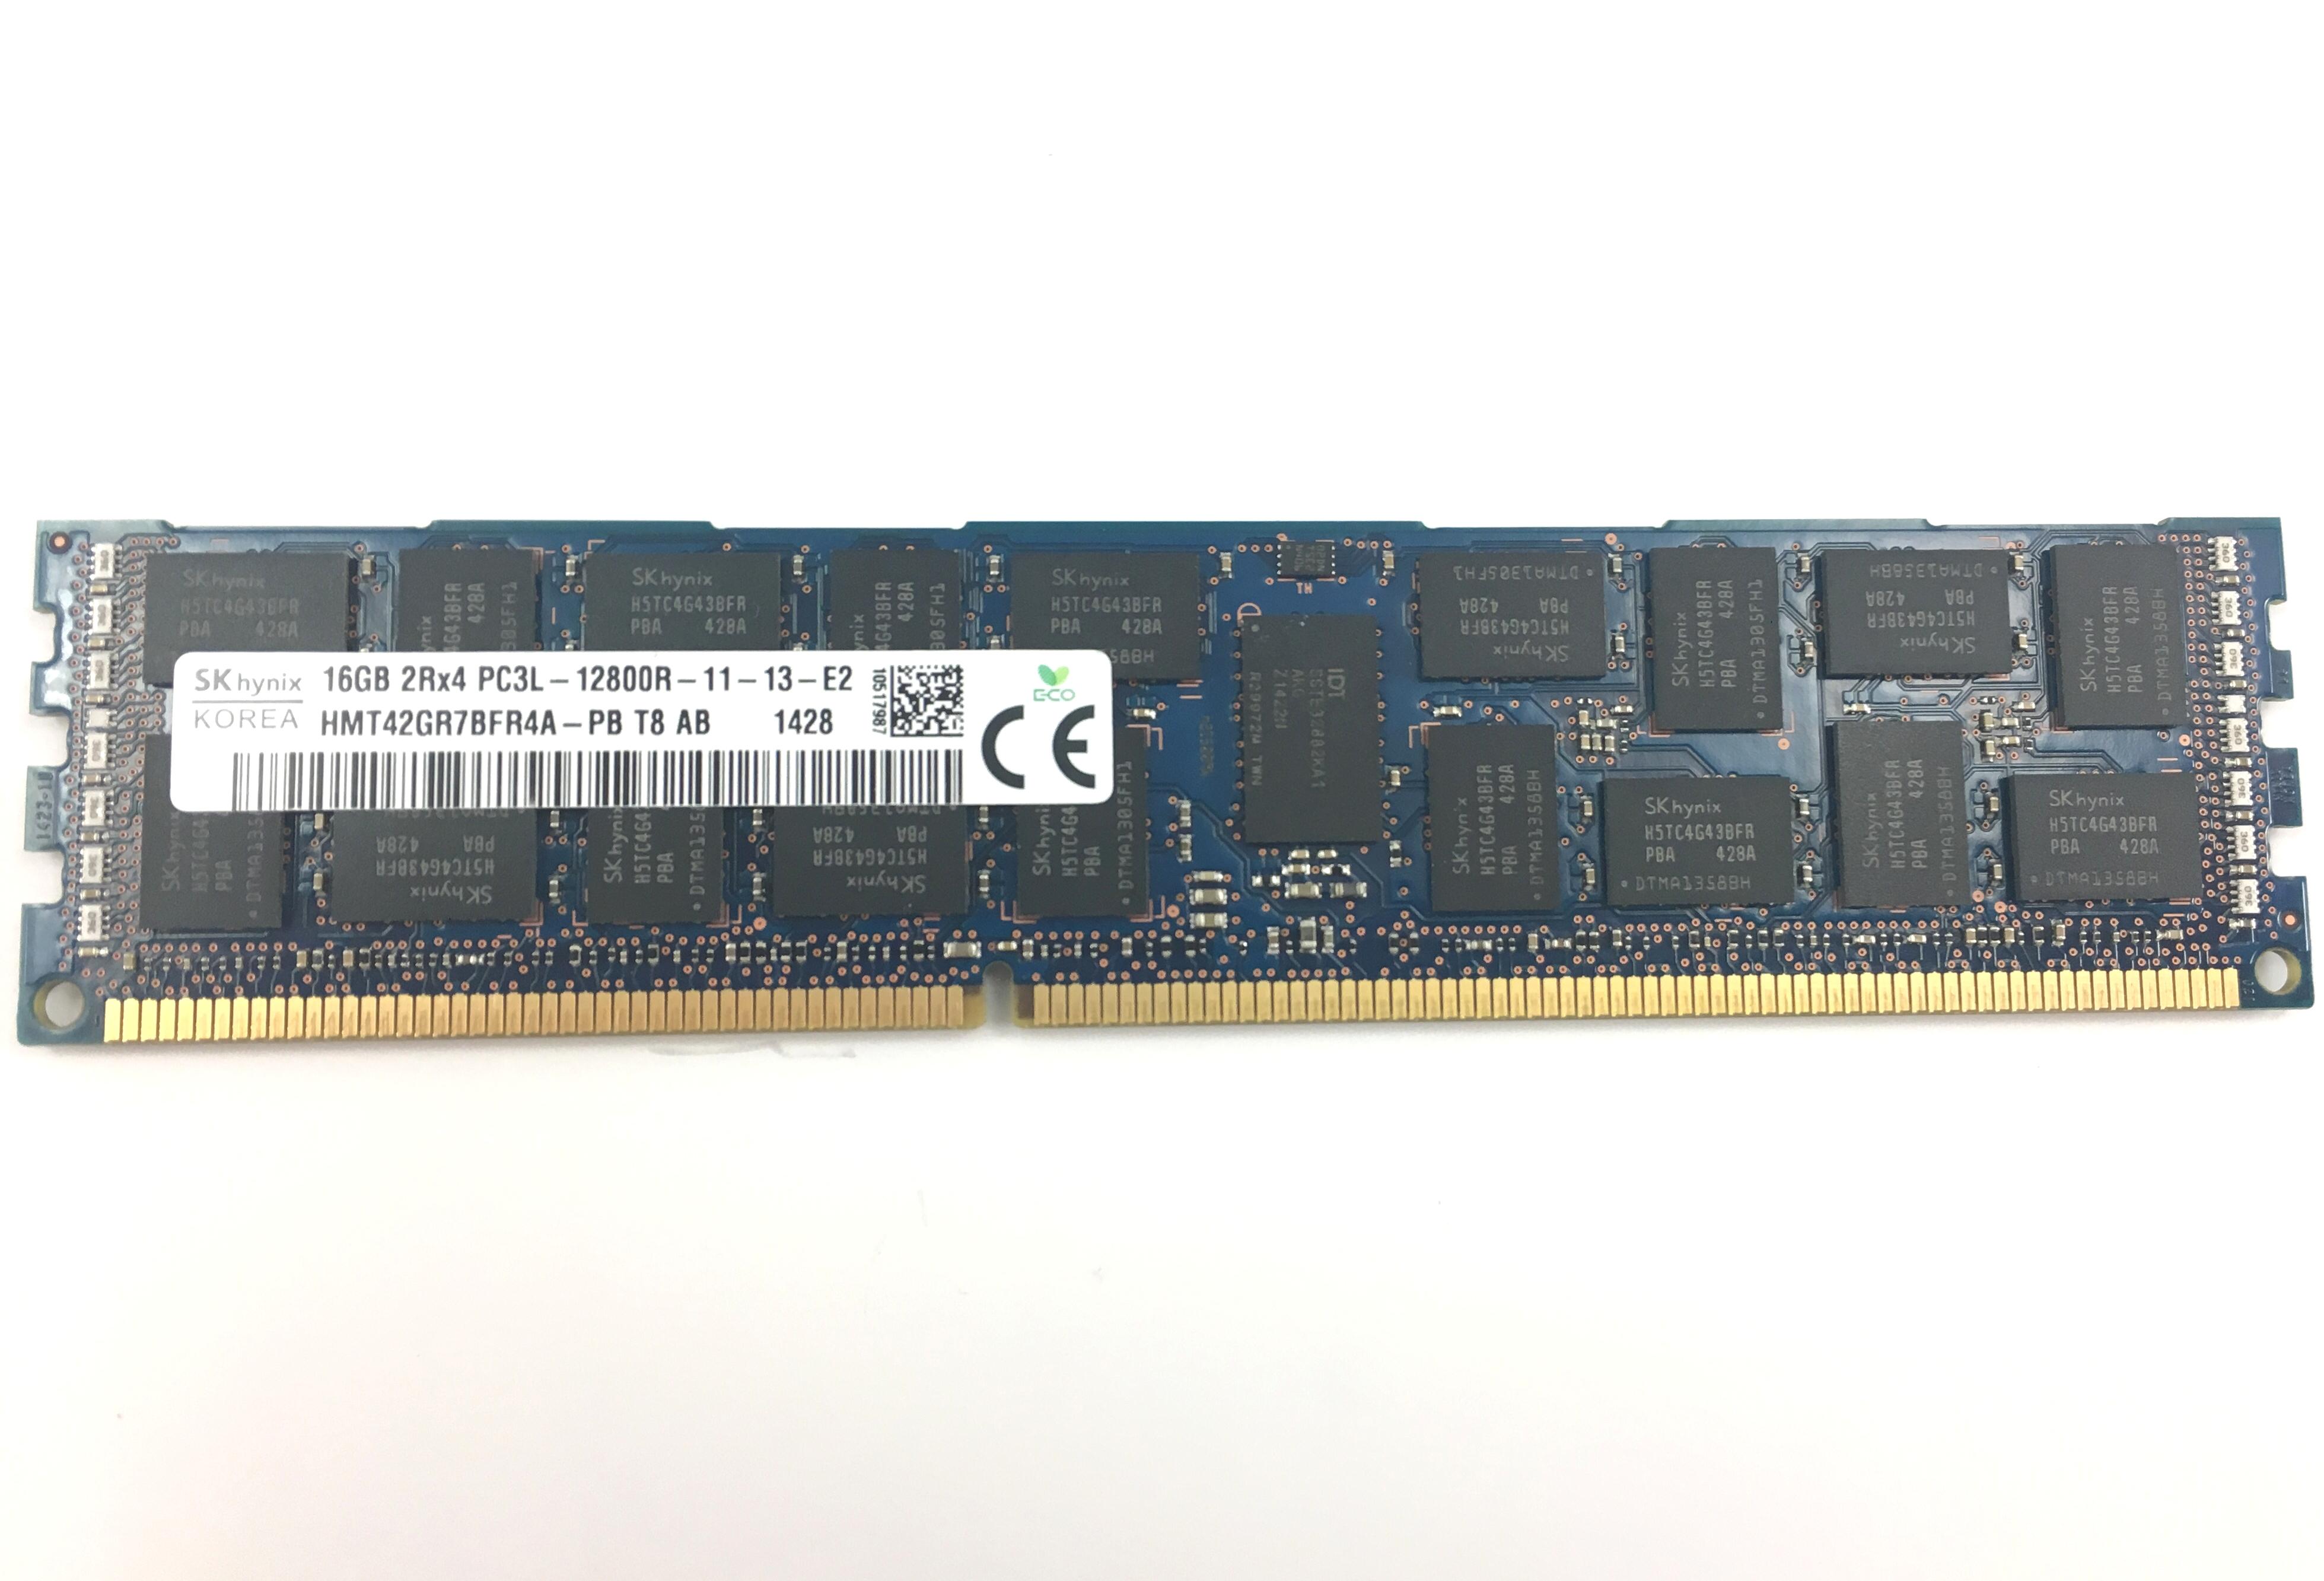 Hynix 16GB 2Rx4 PC3L-12800R DDR3 ECC REG Memory (HMT42GR7BFR4A-PB)